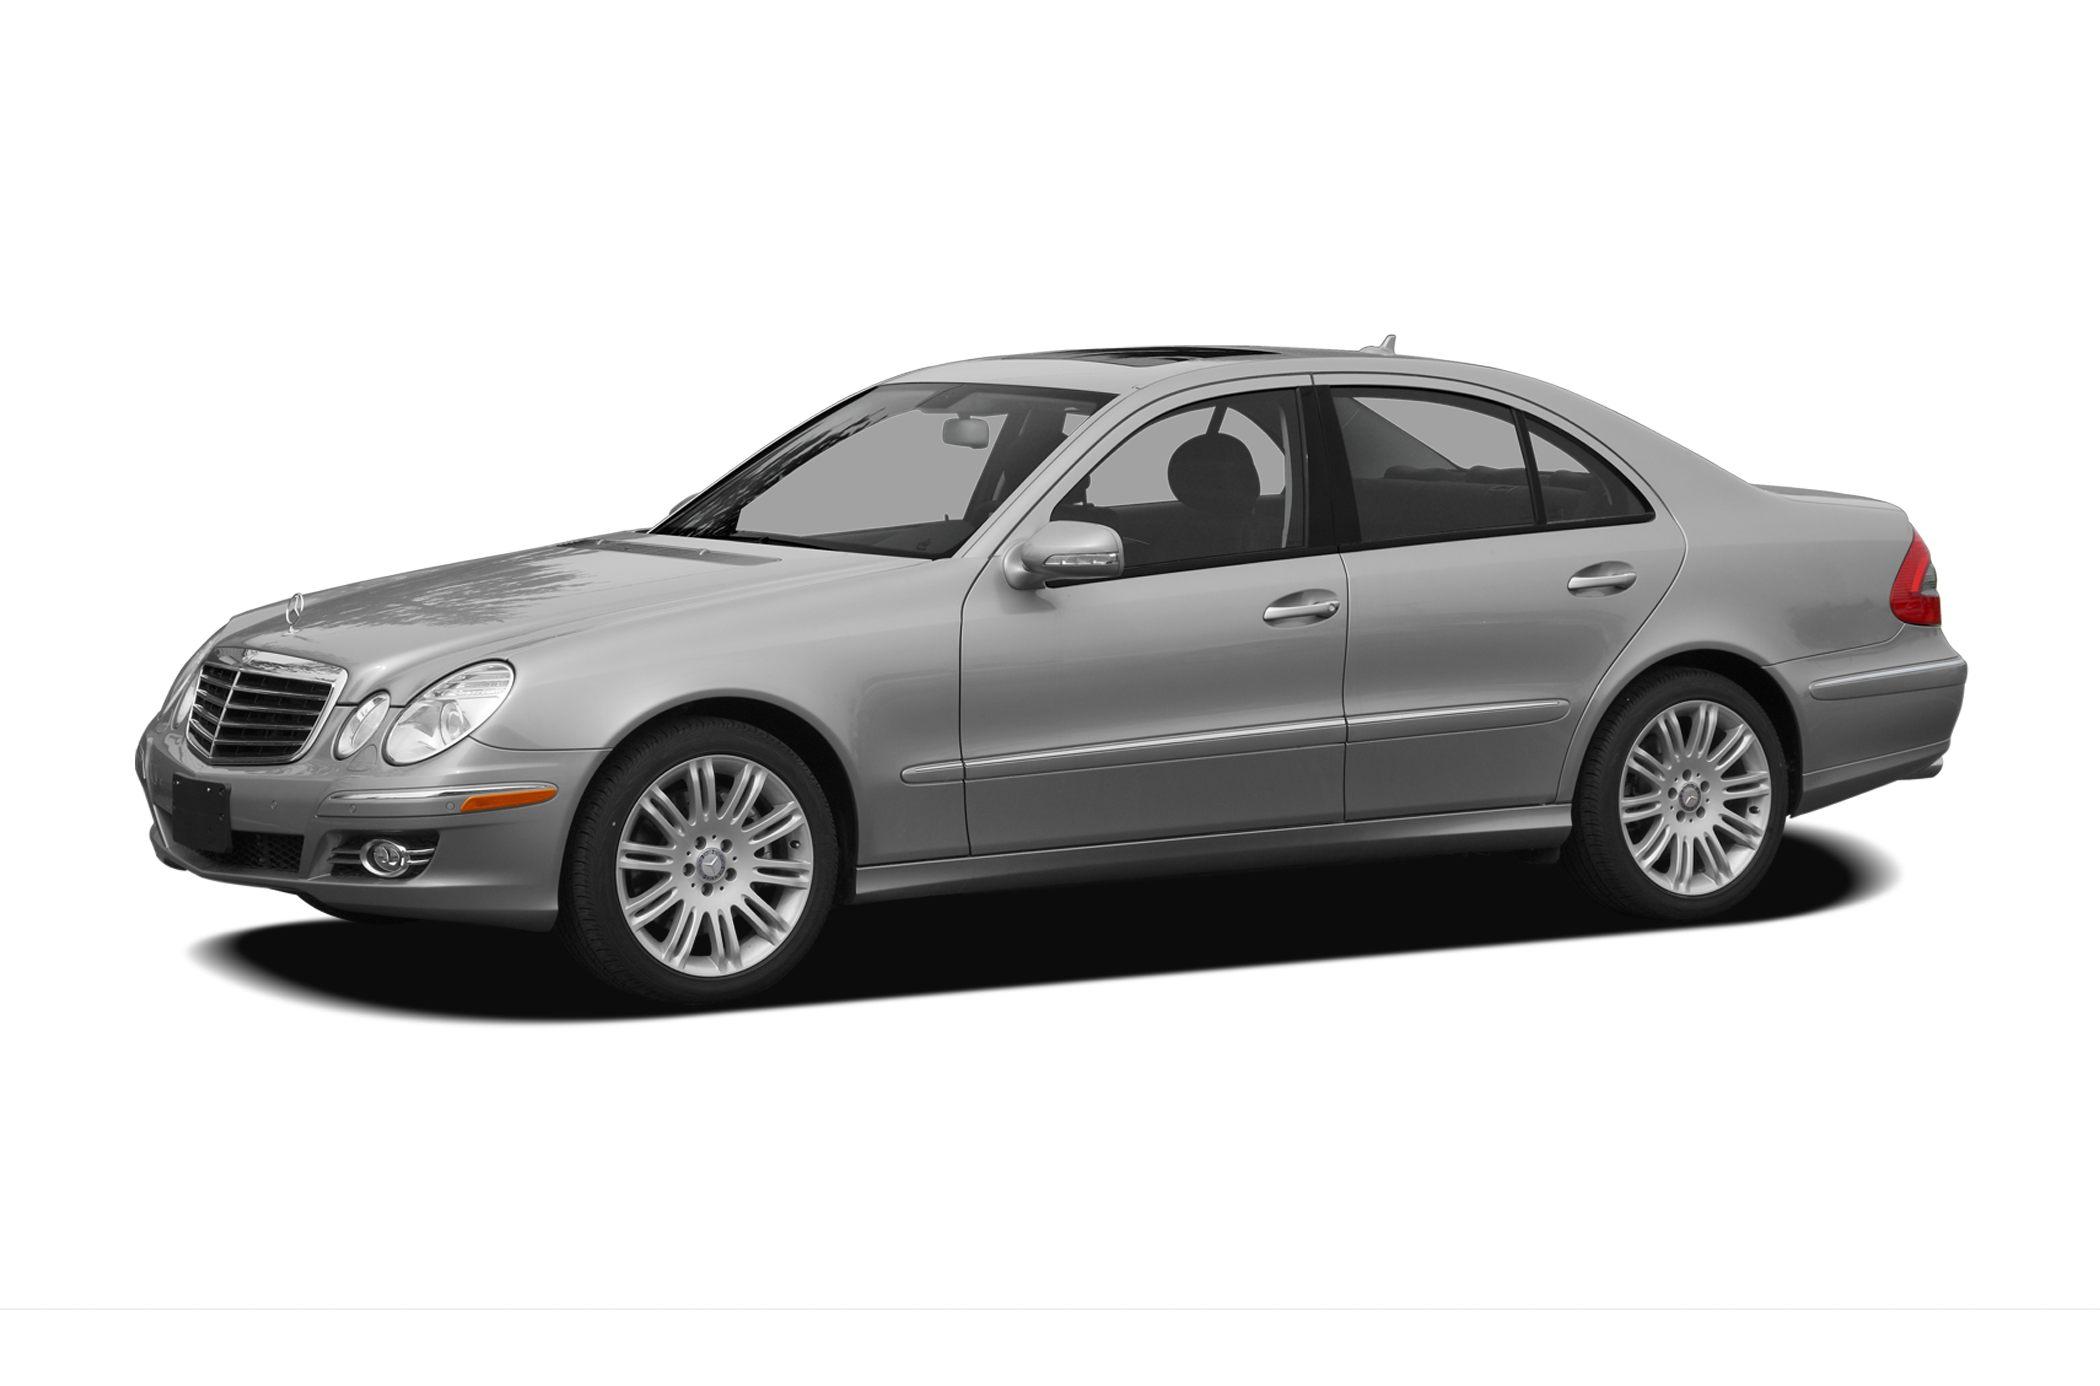 2007 Mercedes Benz E Class Safety Features